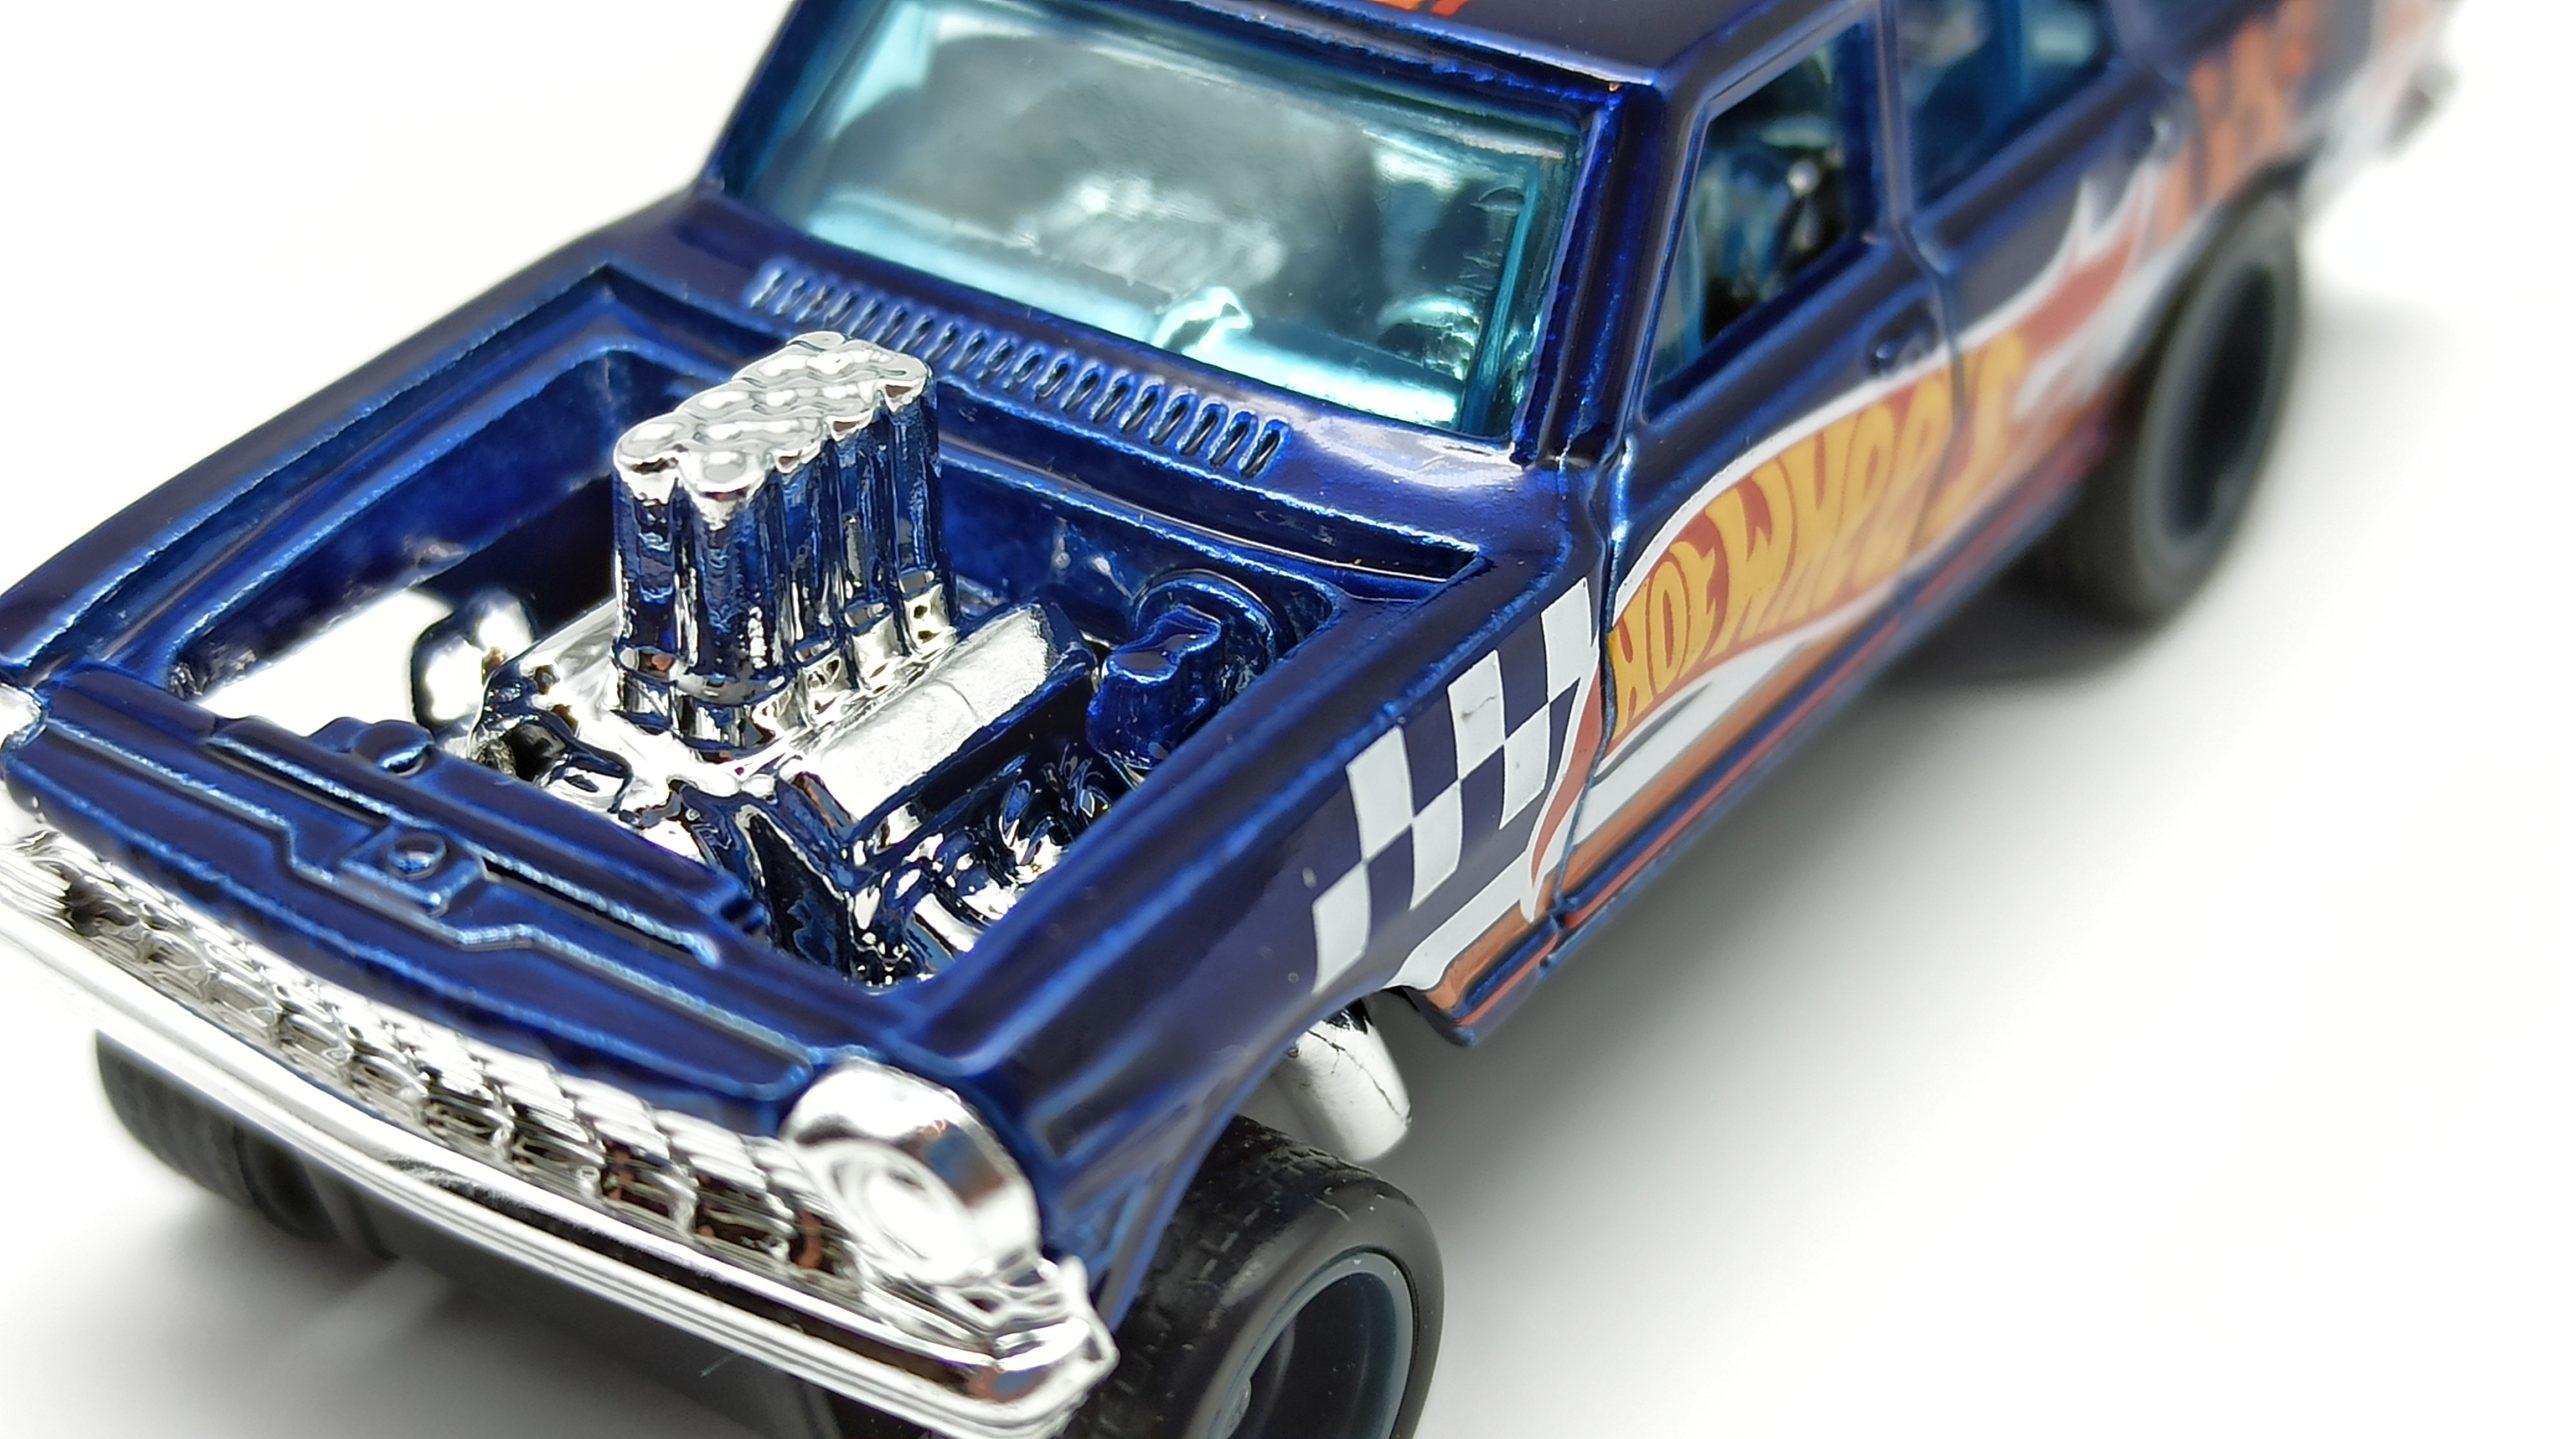 Hot Wheels '64 Chevy Nova Wagon Gasser (GTD06) 2021 (232/250) HW Race Team (7/10) spectraflame blue Super Treasure Hunt (STH) engine